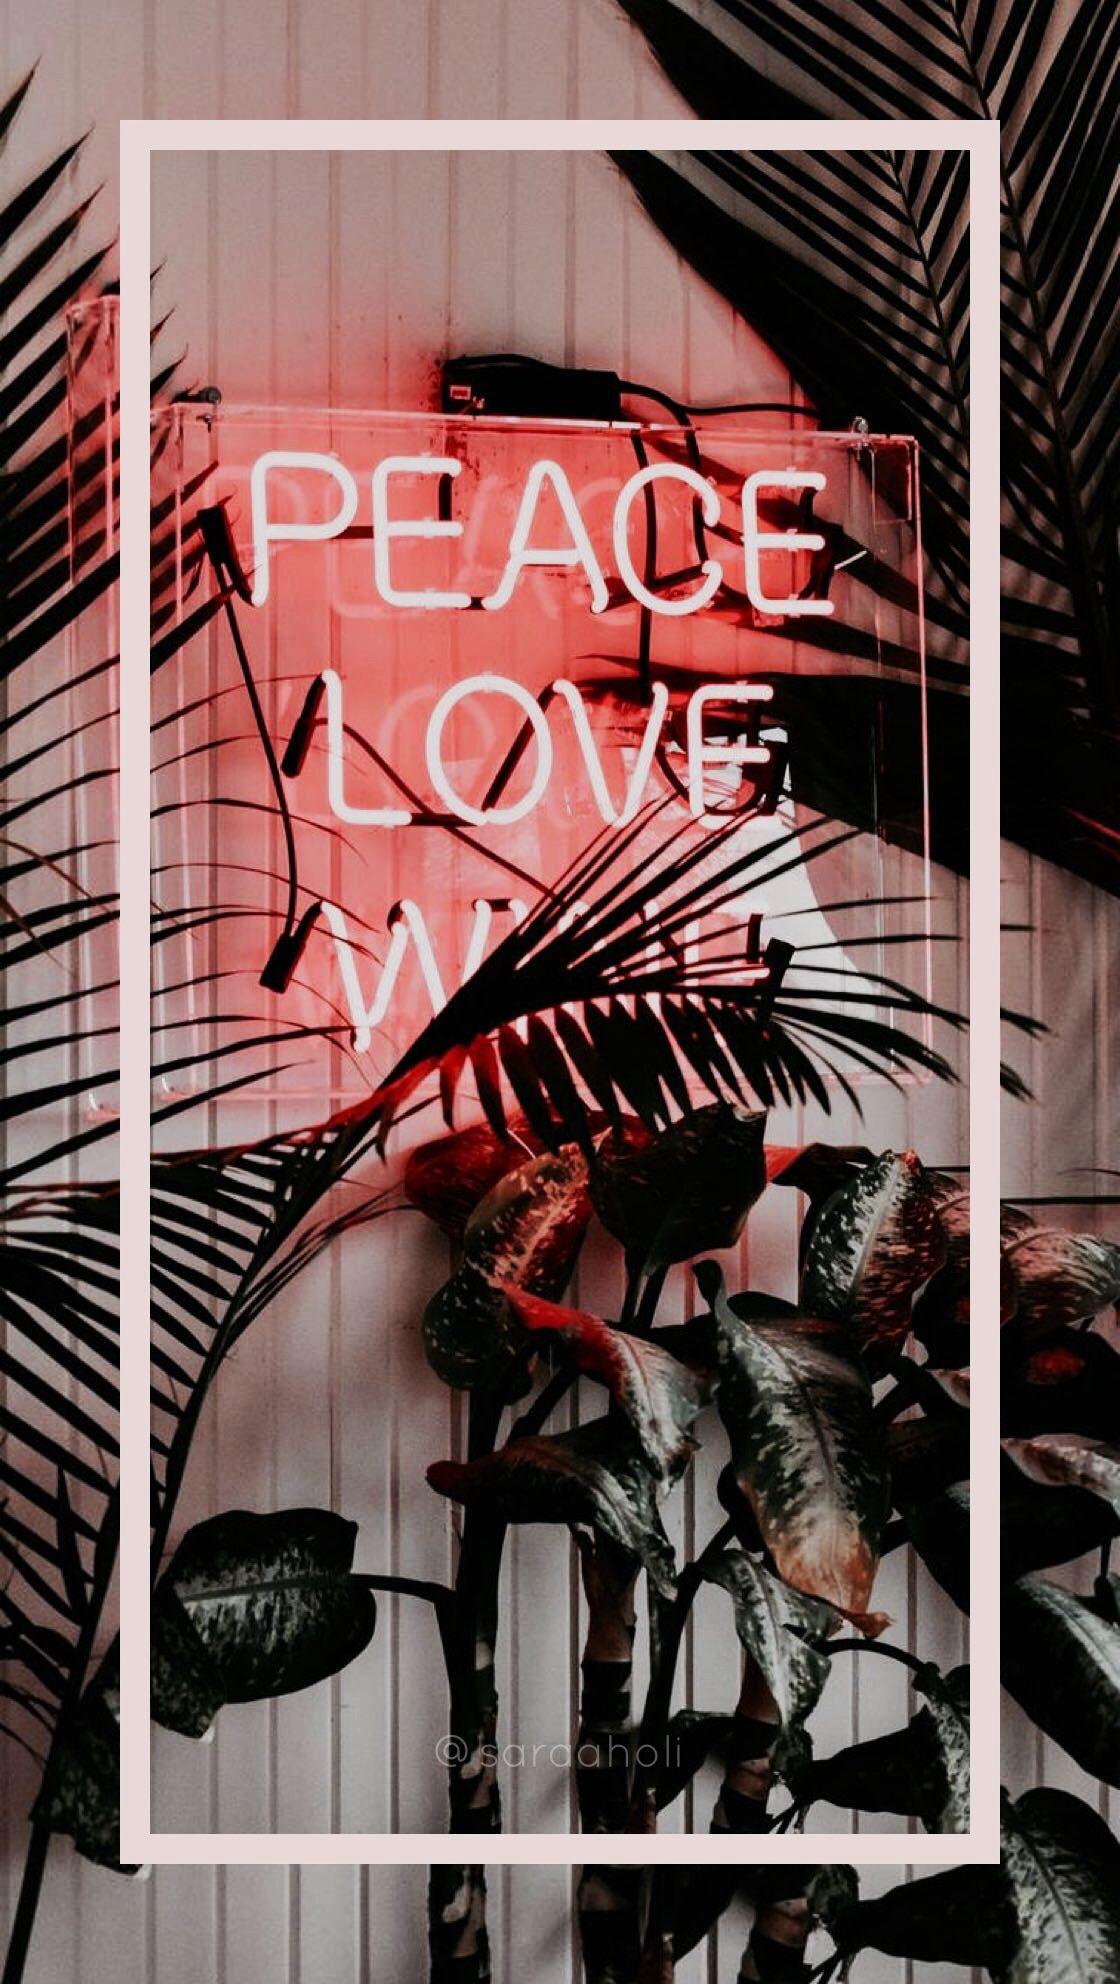 Aesthetic Collage Wallpaper Neon Aesthetic